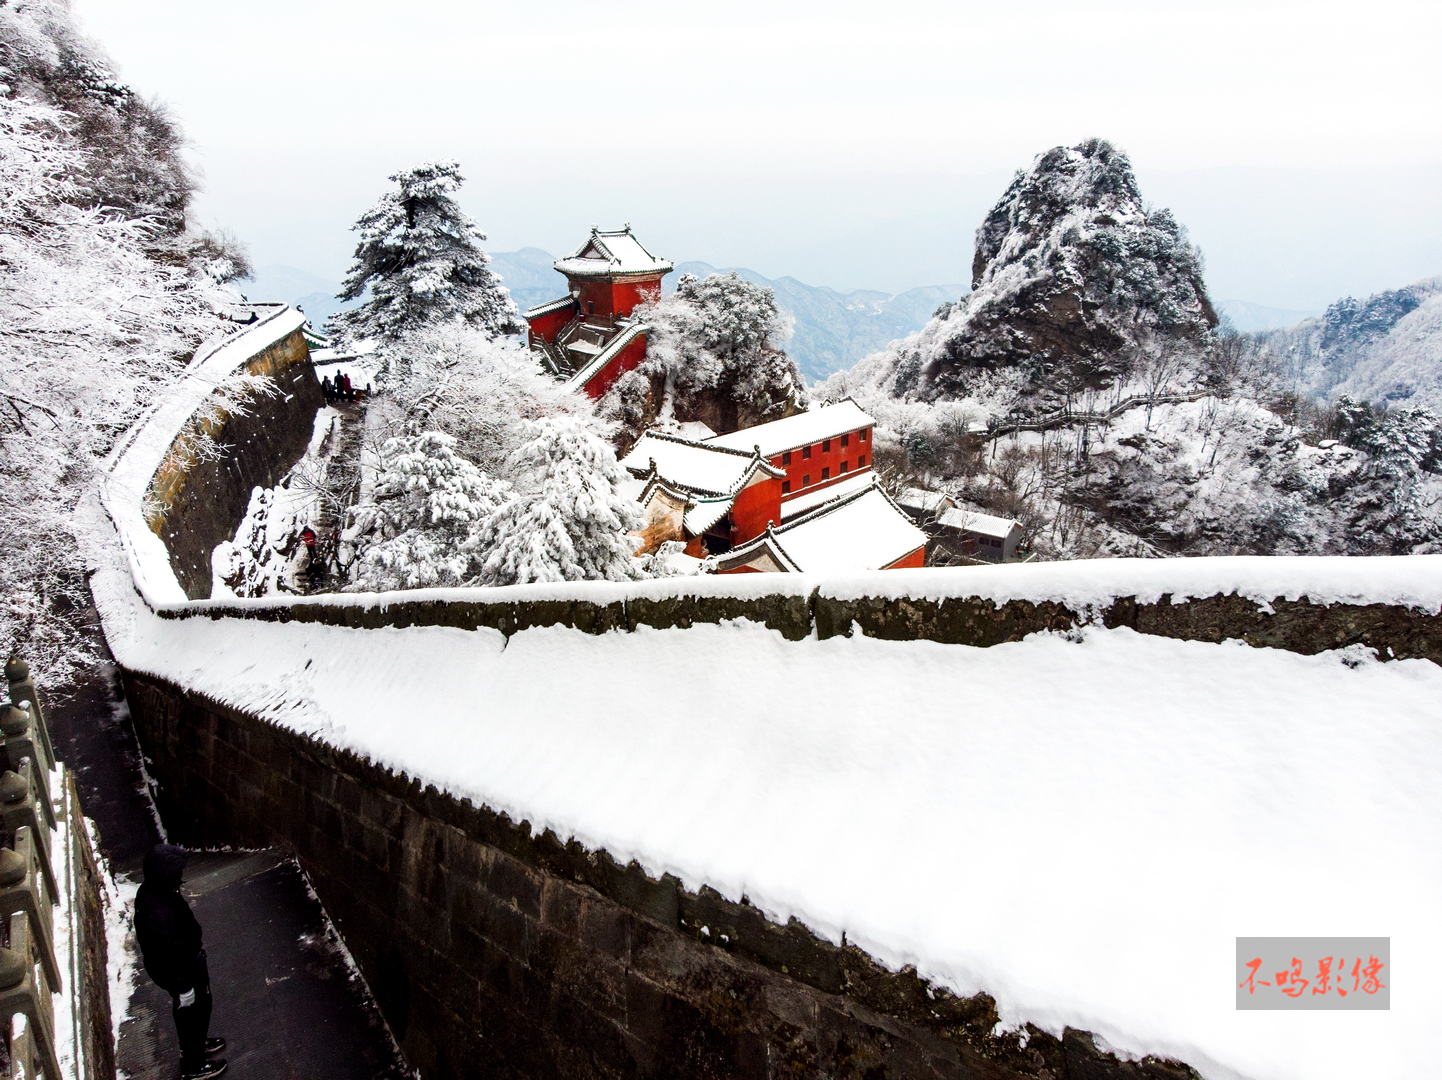 hk_c_65,雪后武当山.jpeg